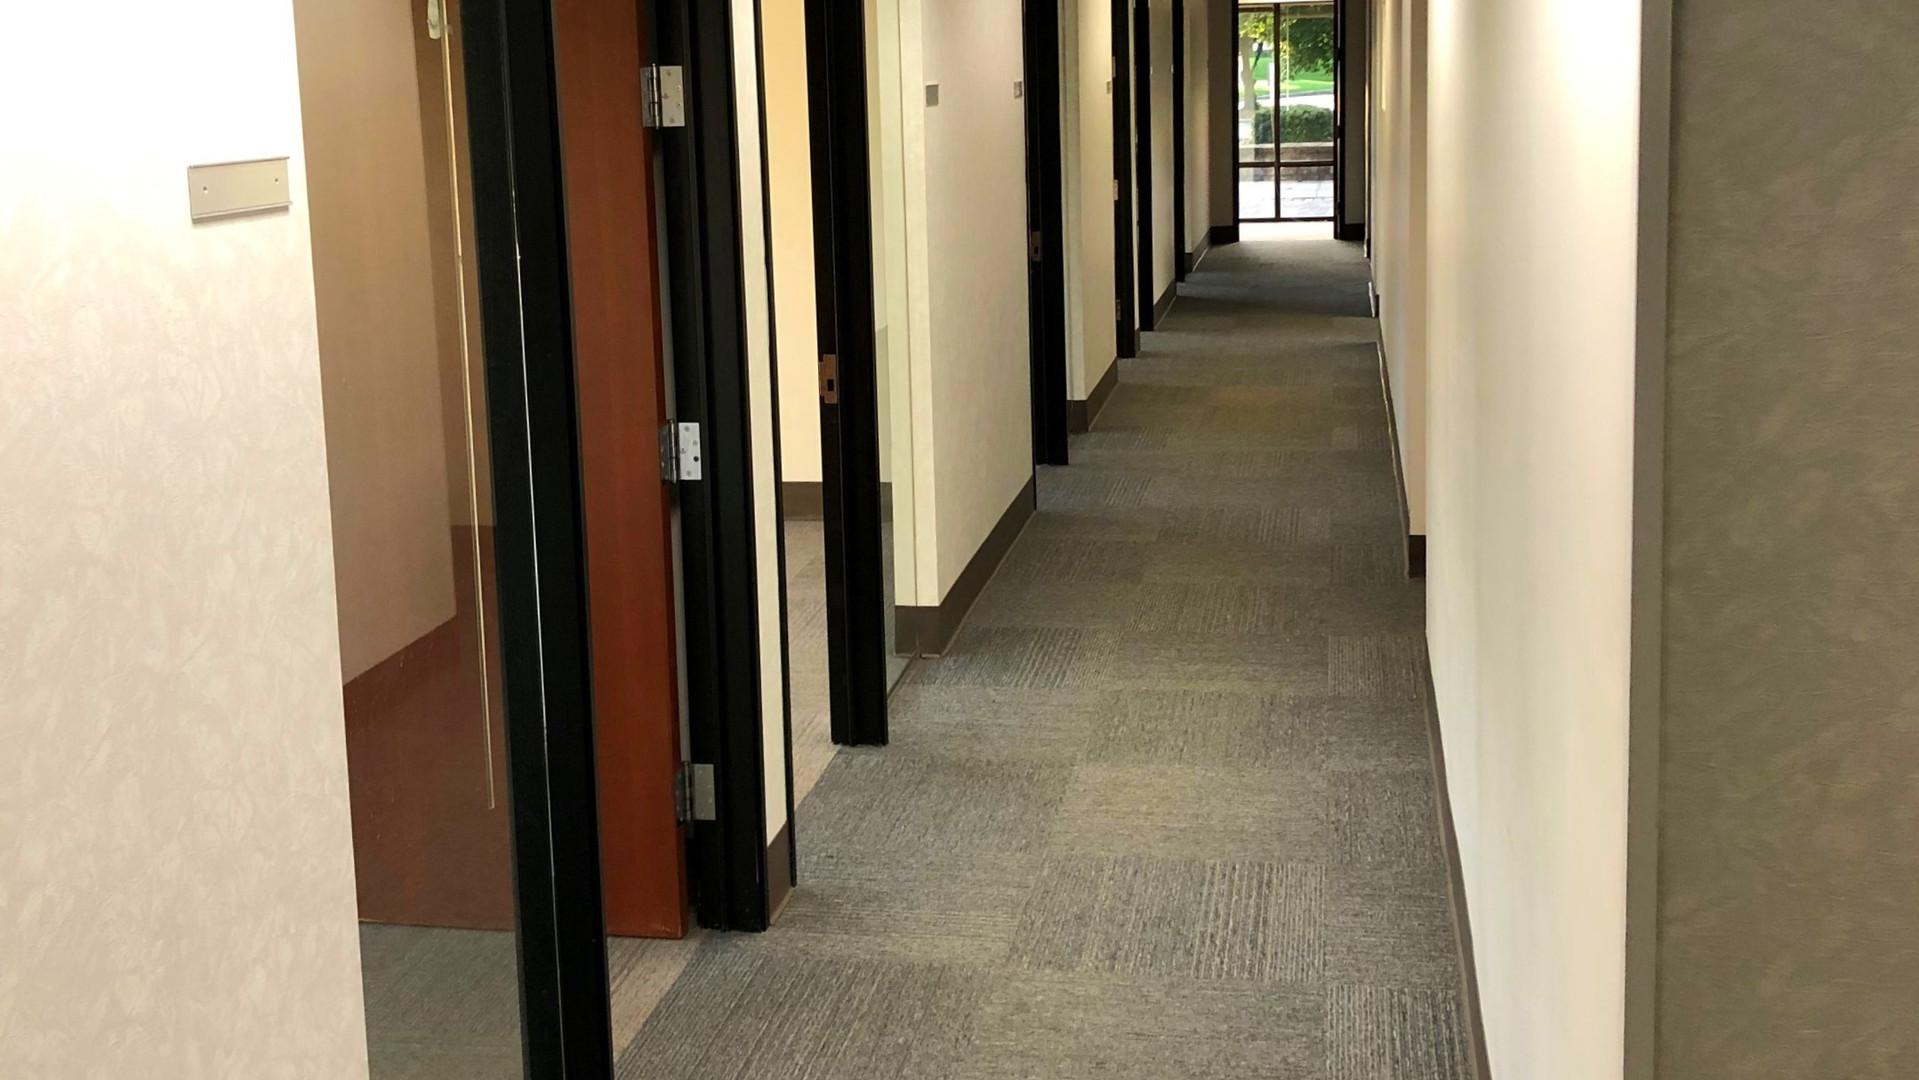 Vacant Space Hallway